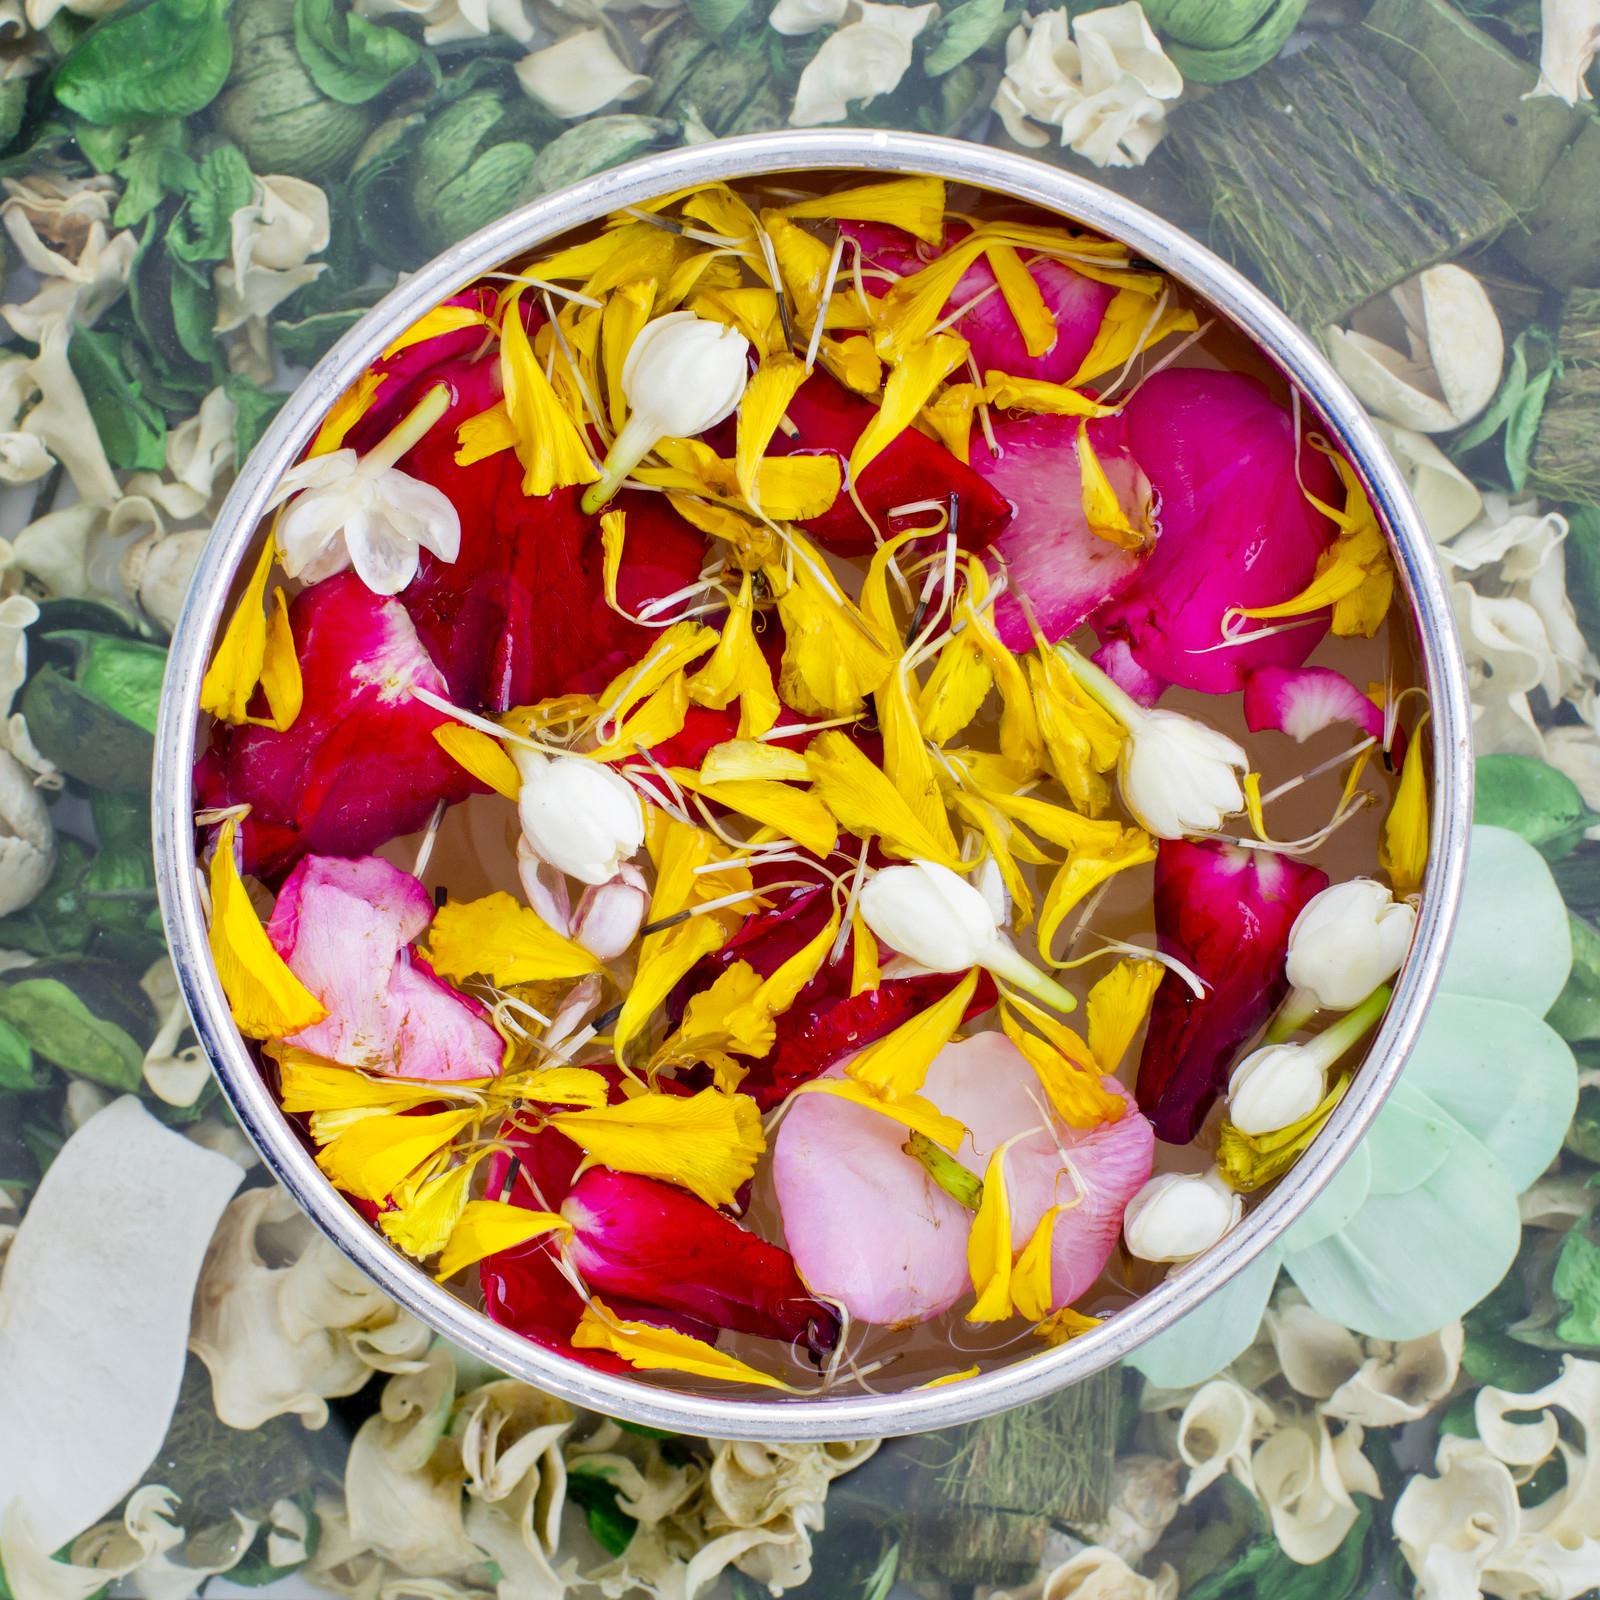 Jasmine and Roses Surplus Fragrance Oil